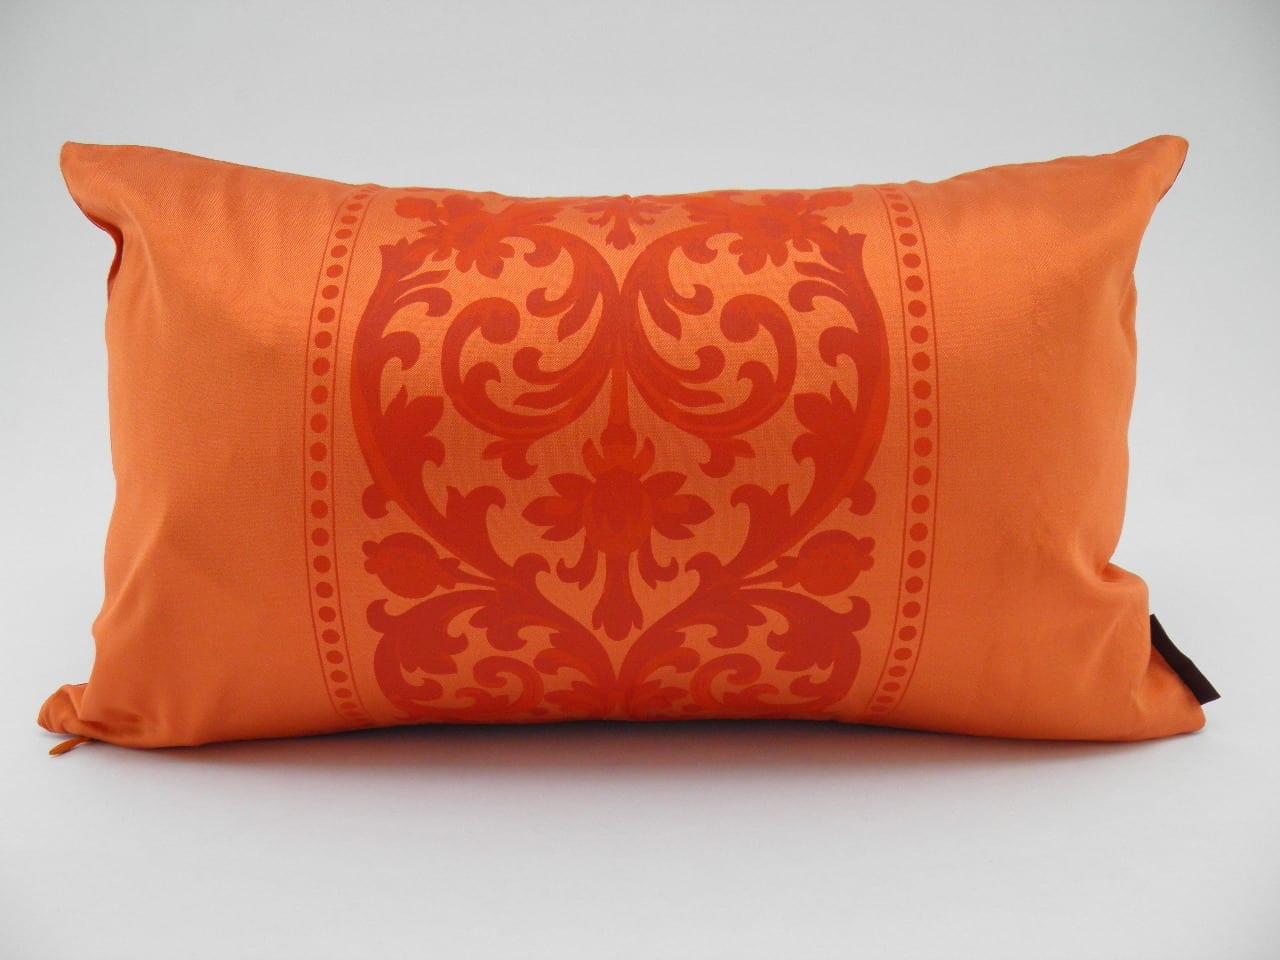 Angkor Cushion Cover – 2 in 1 - Fuchsia / Orange - 45x27cm